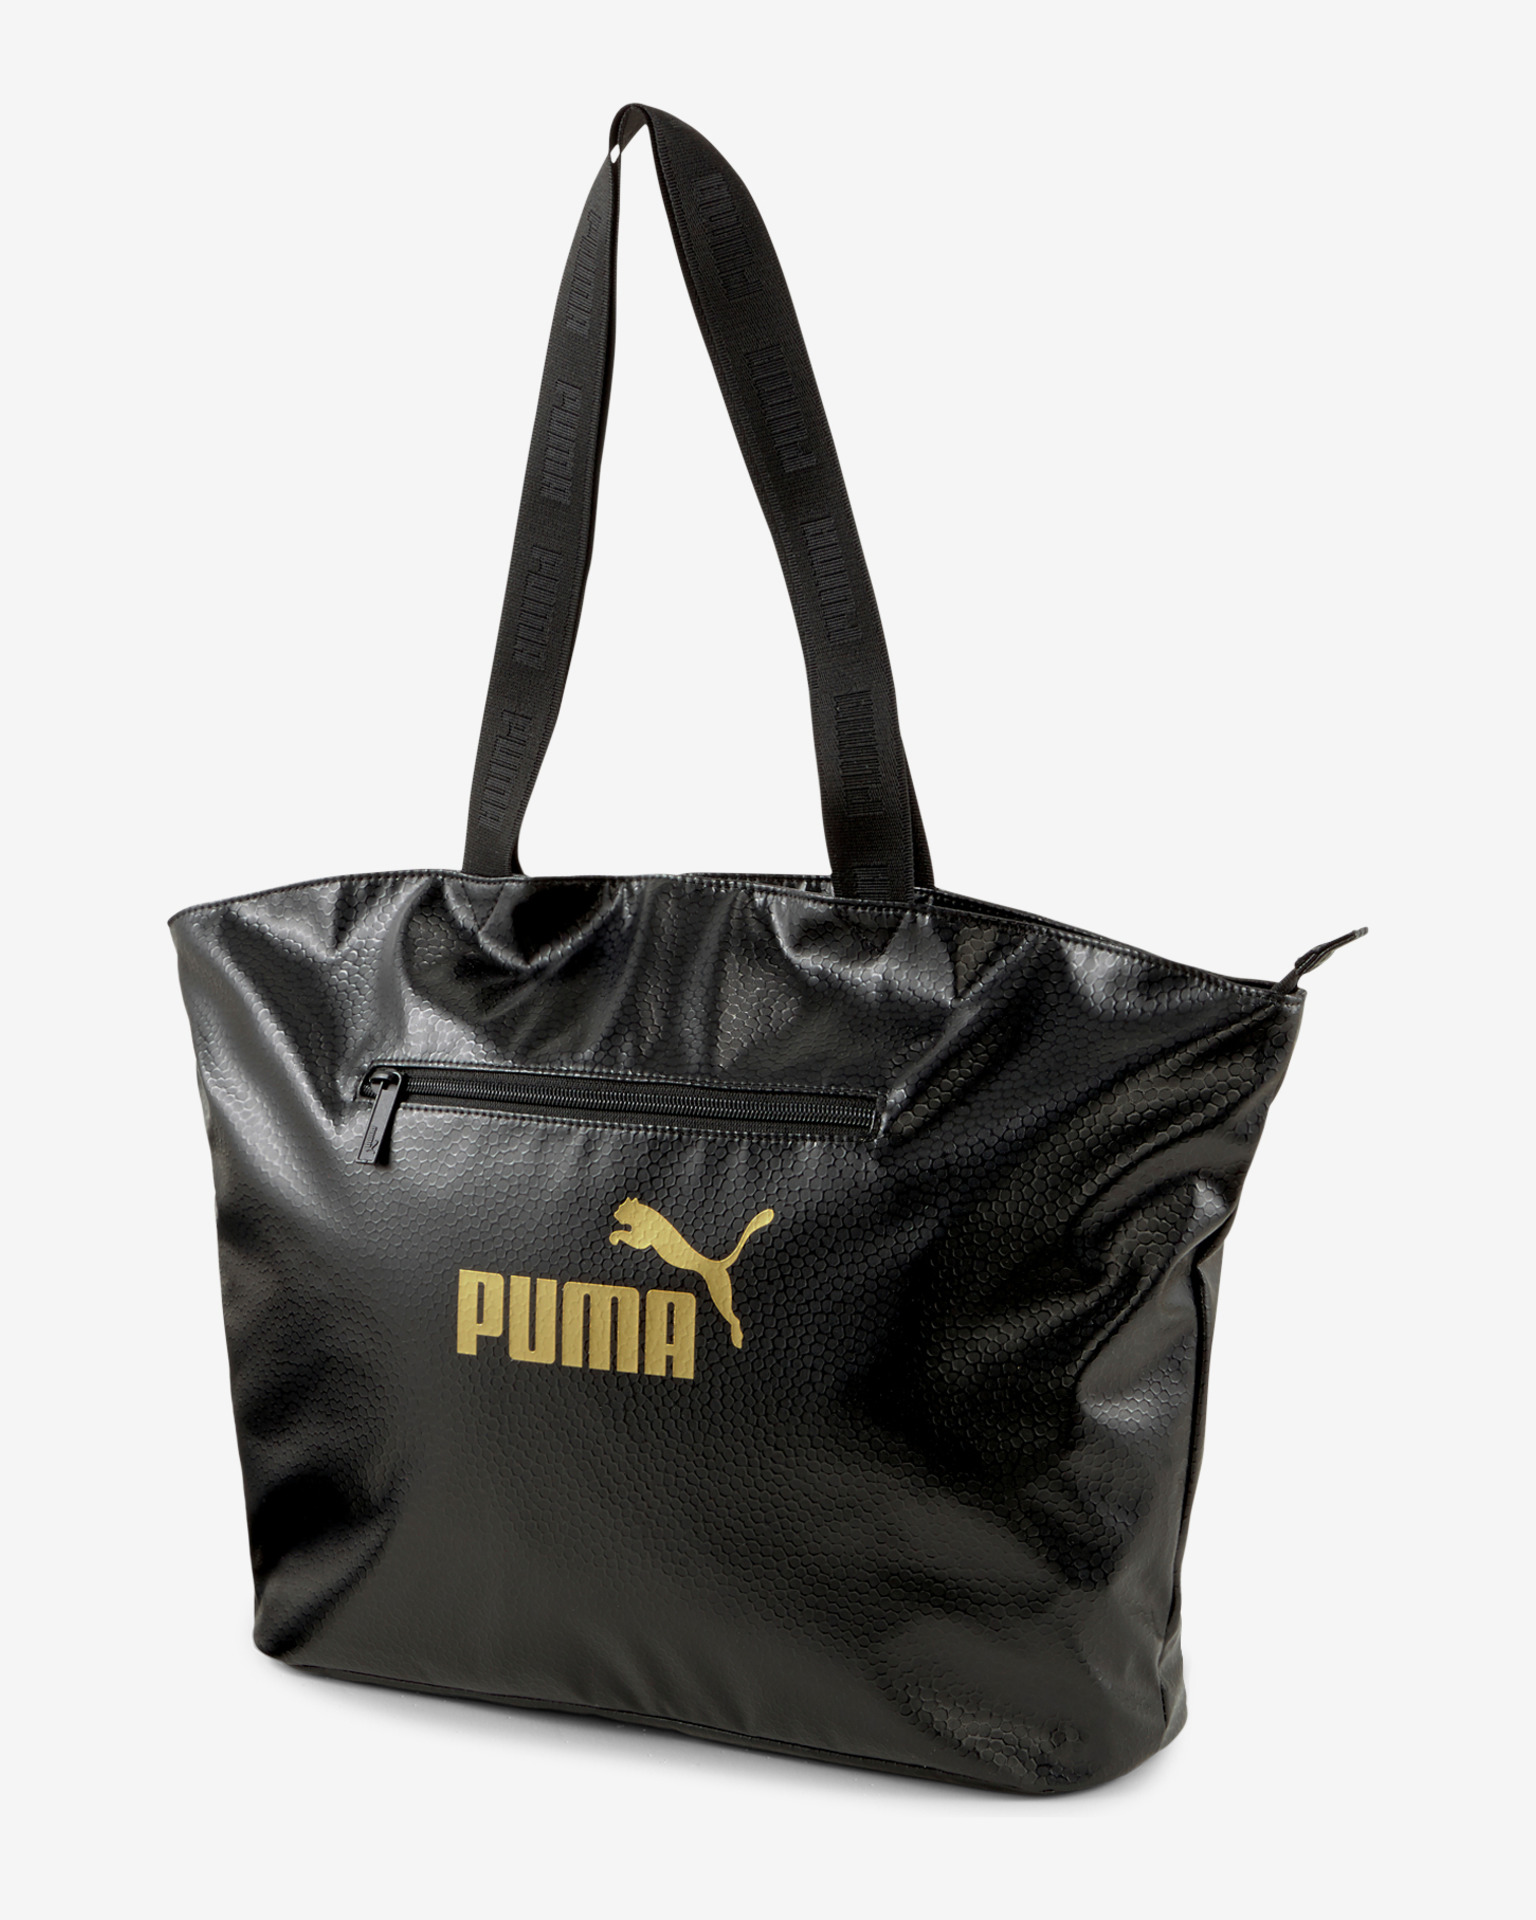 Puma Core Up Large OS Shopper Geantă Negru